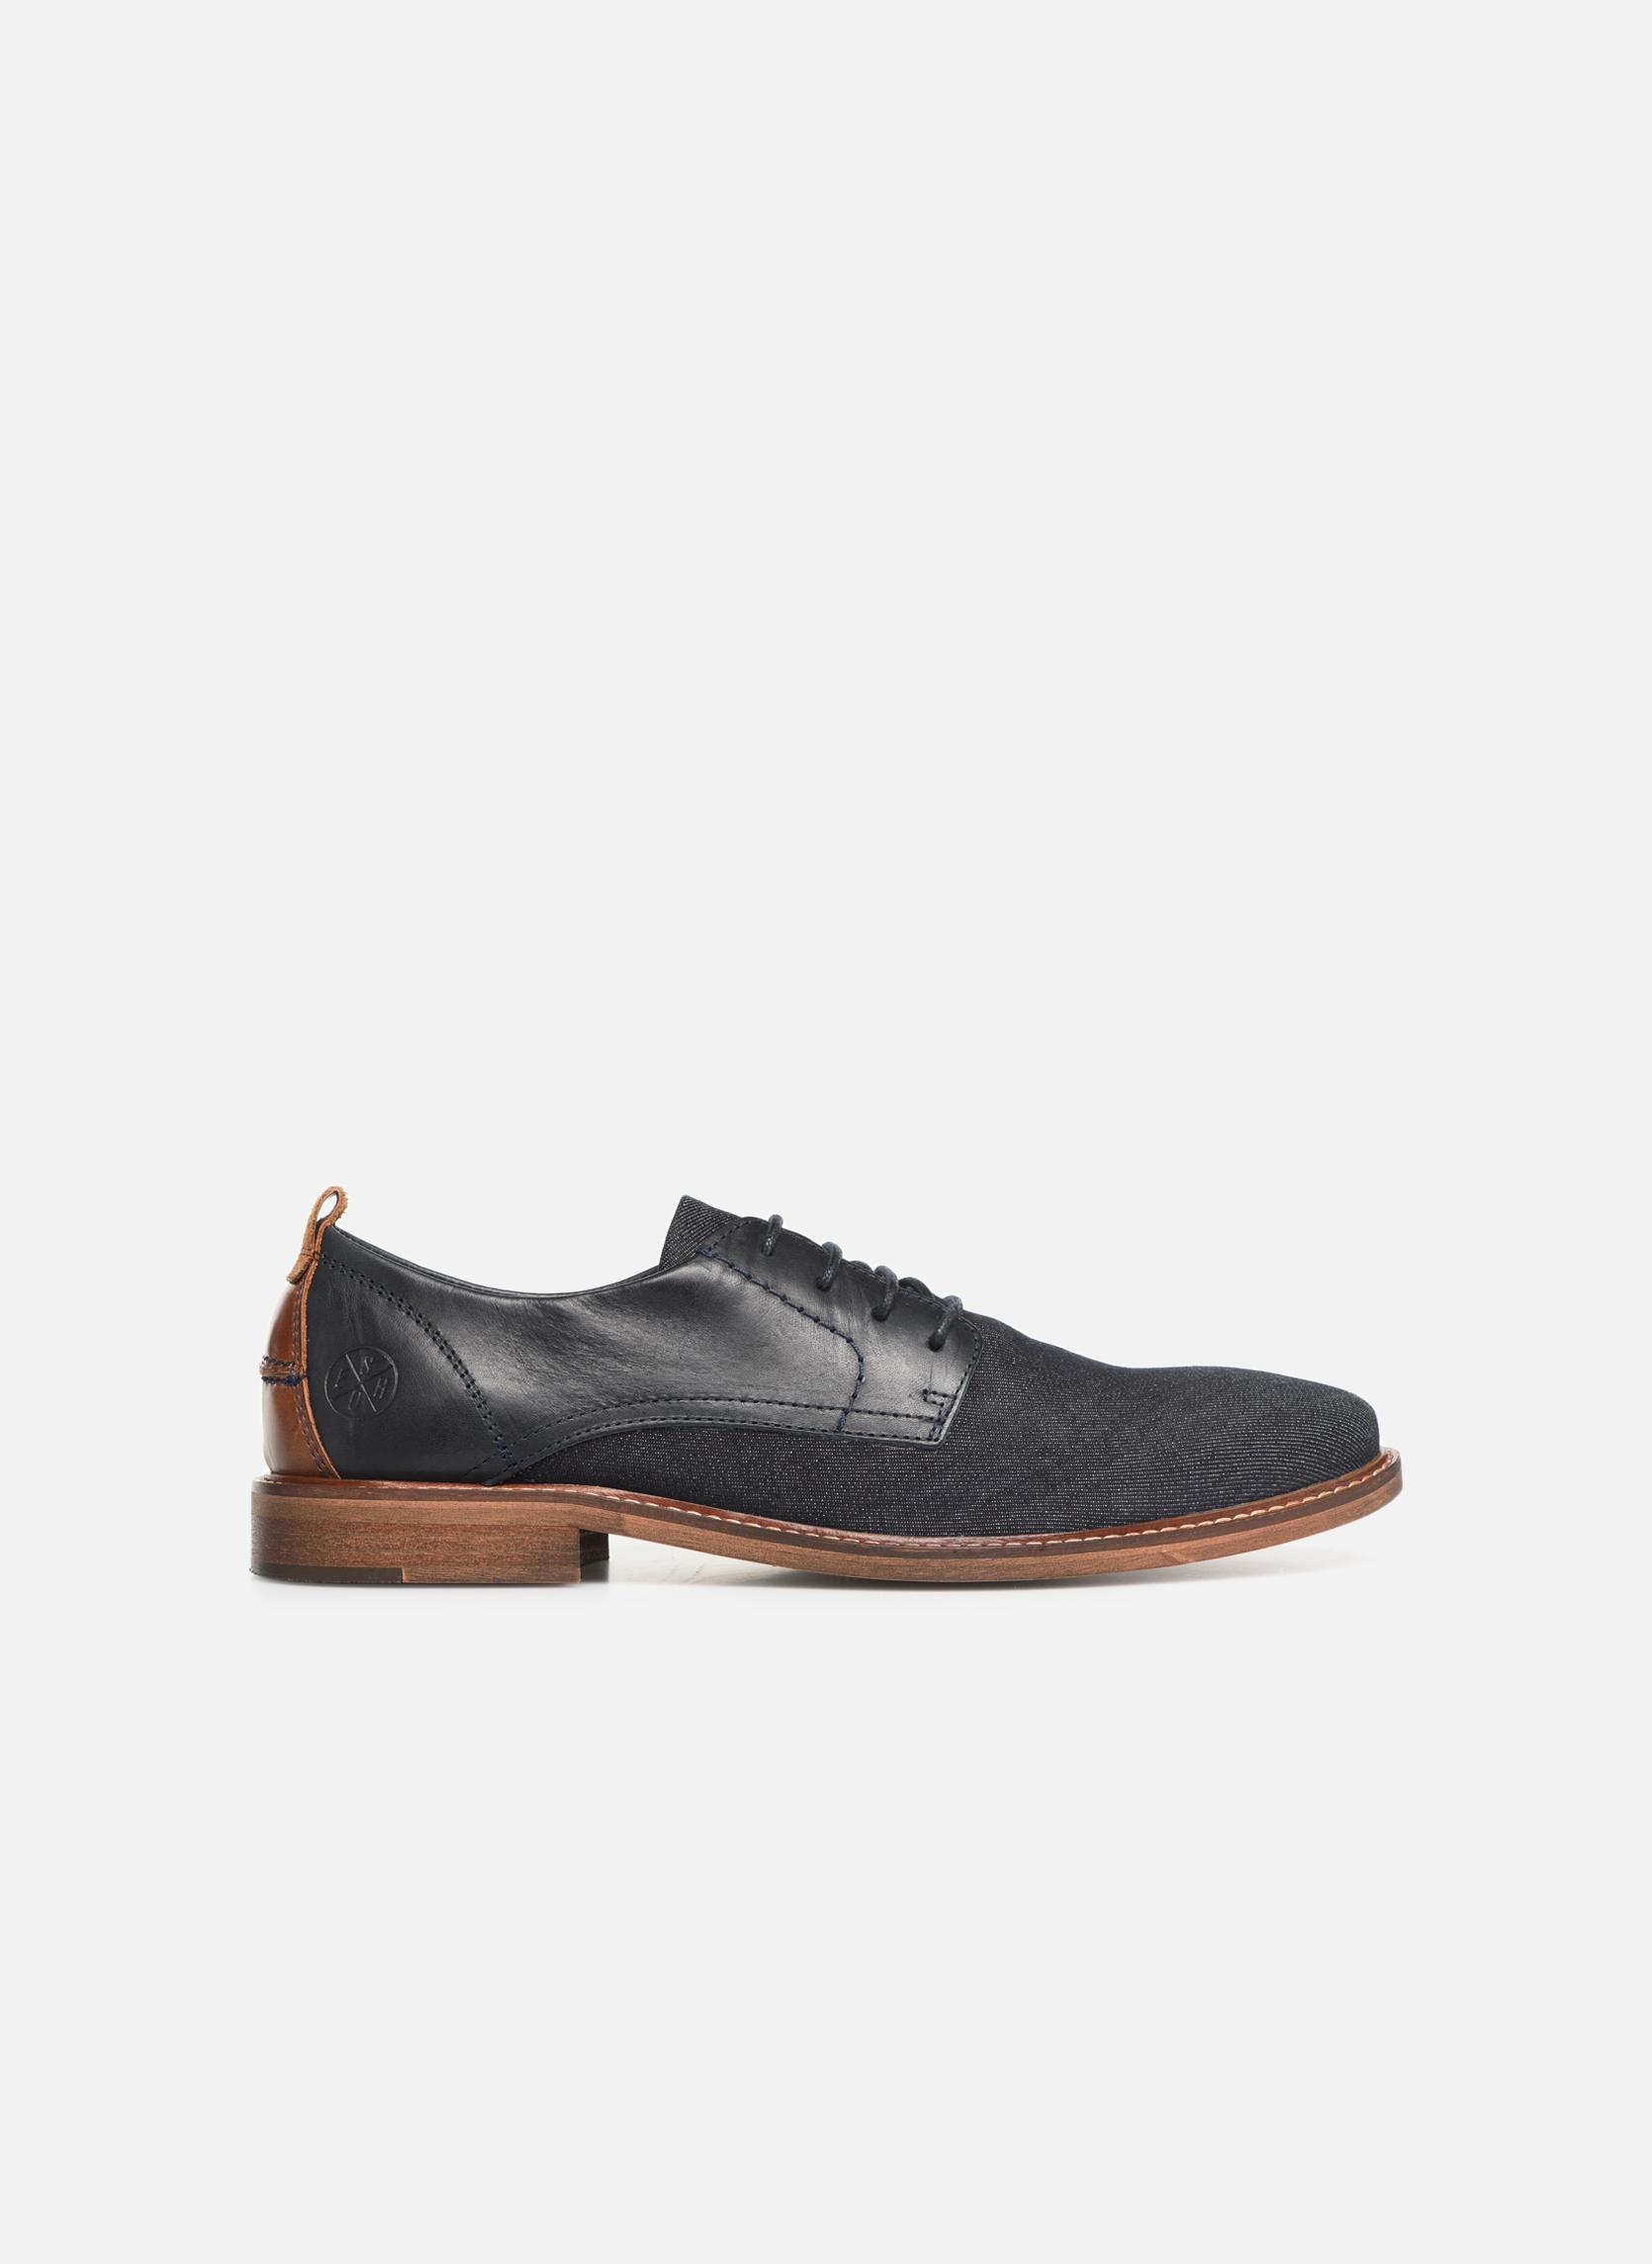 Zapatos hombre online  calzado hombre 948215f40ff